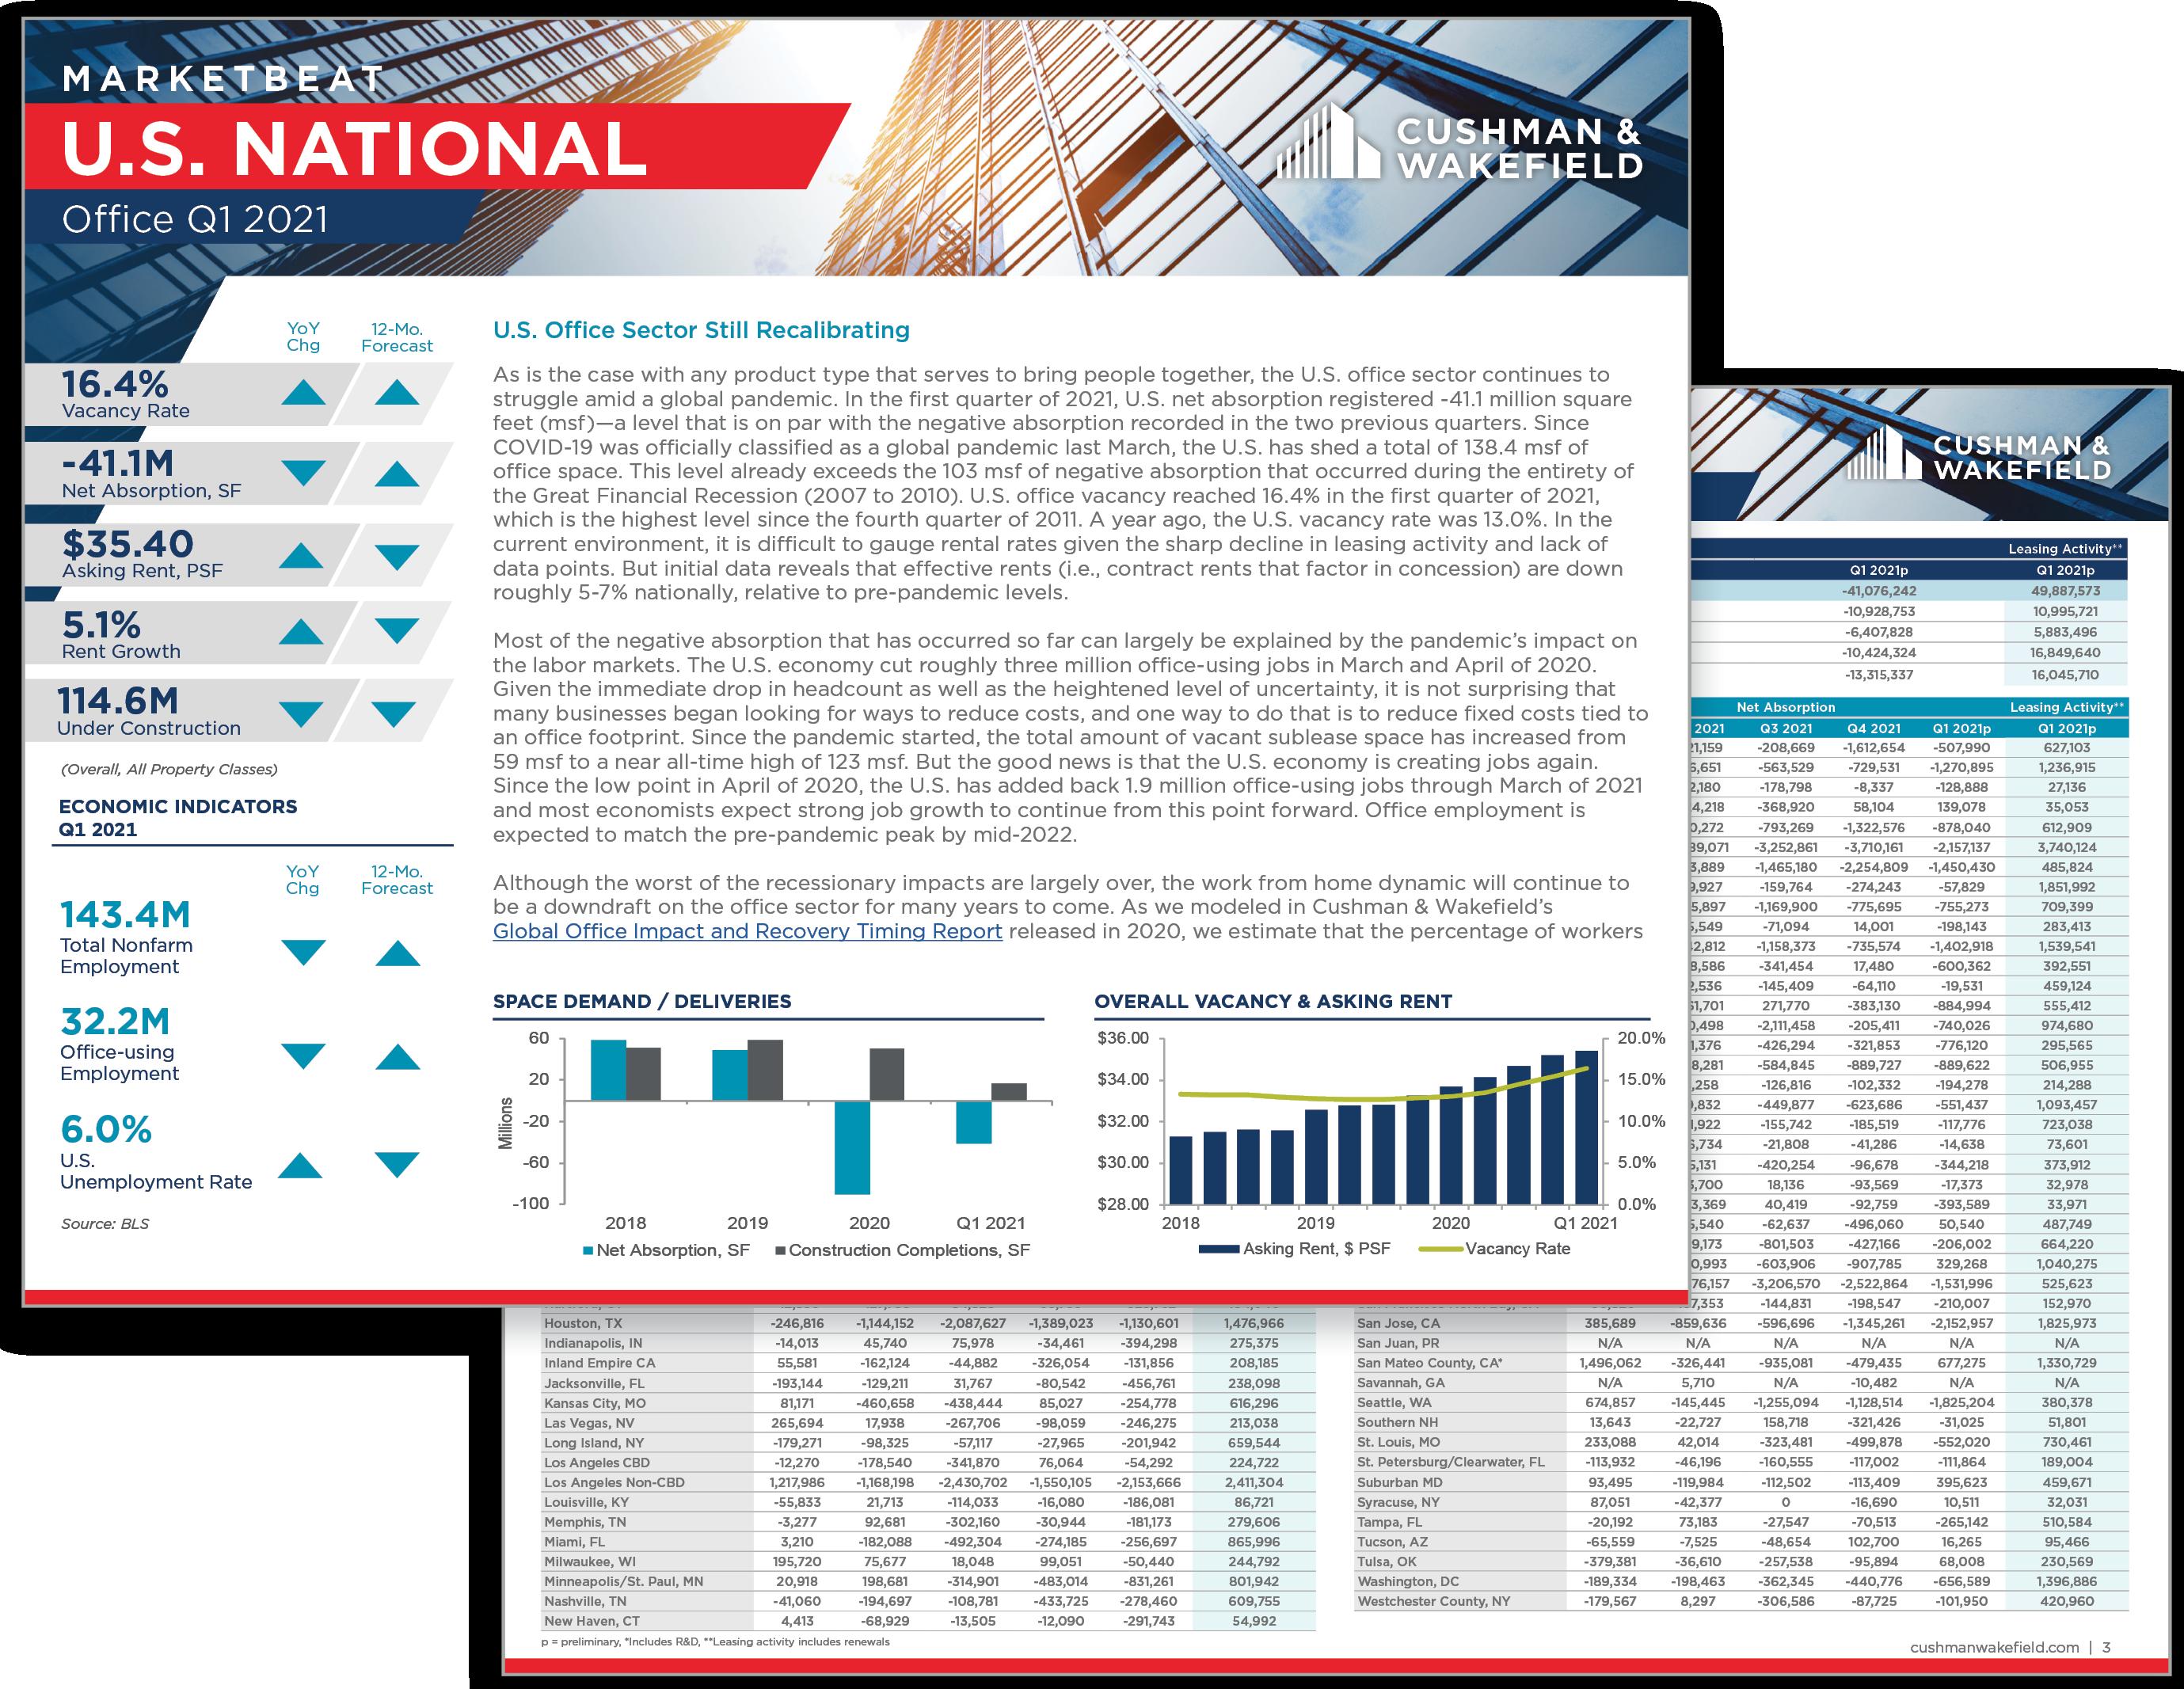 Q2 2020 US Retail MarketBeat Report Thumbnail